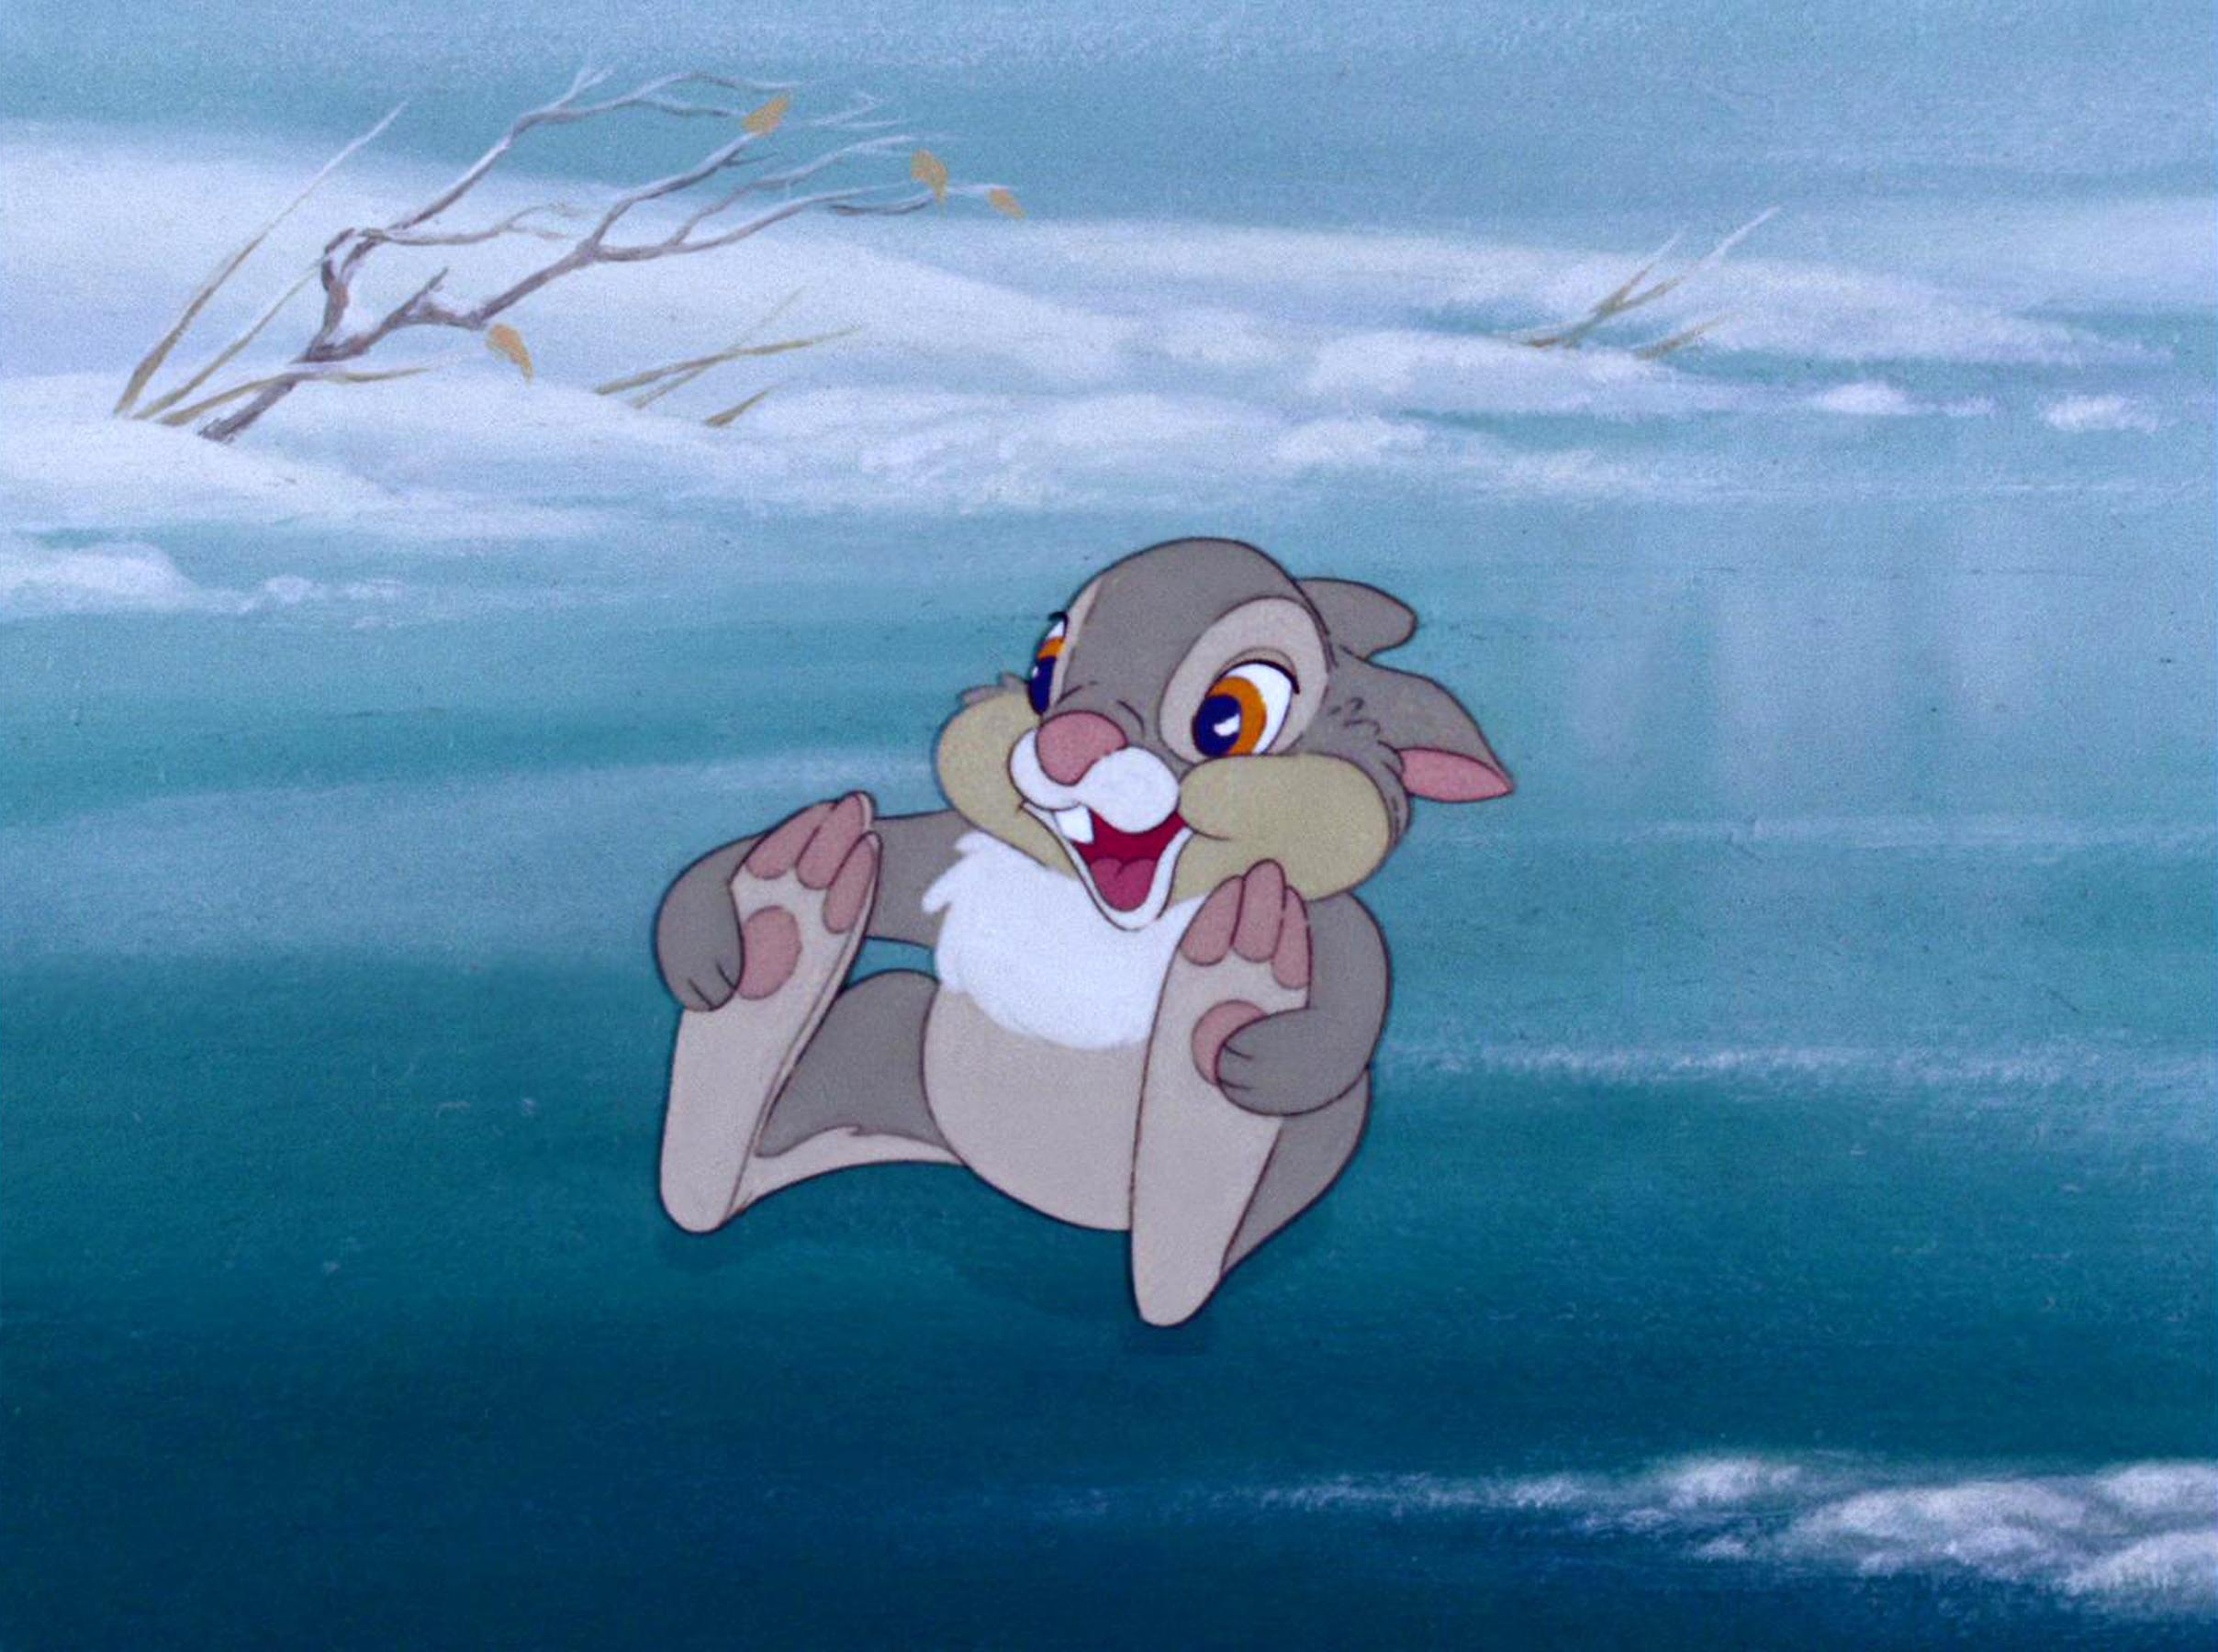 Thumper on ice.